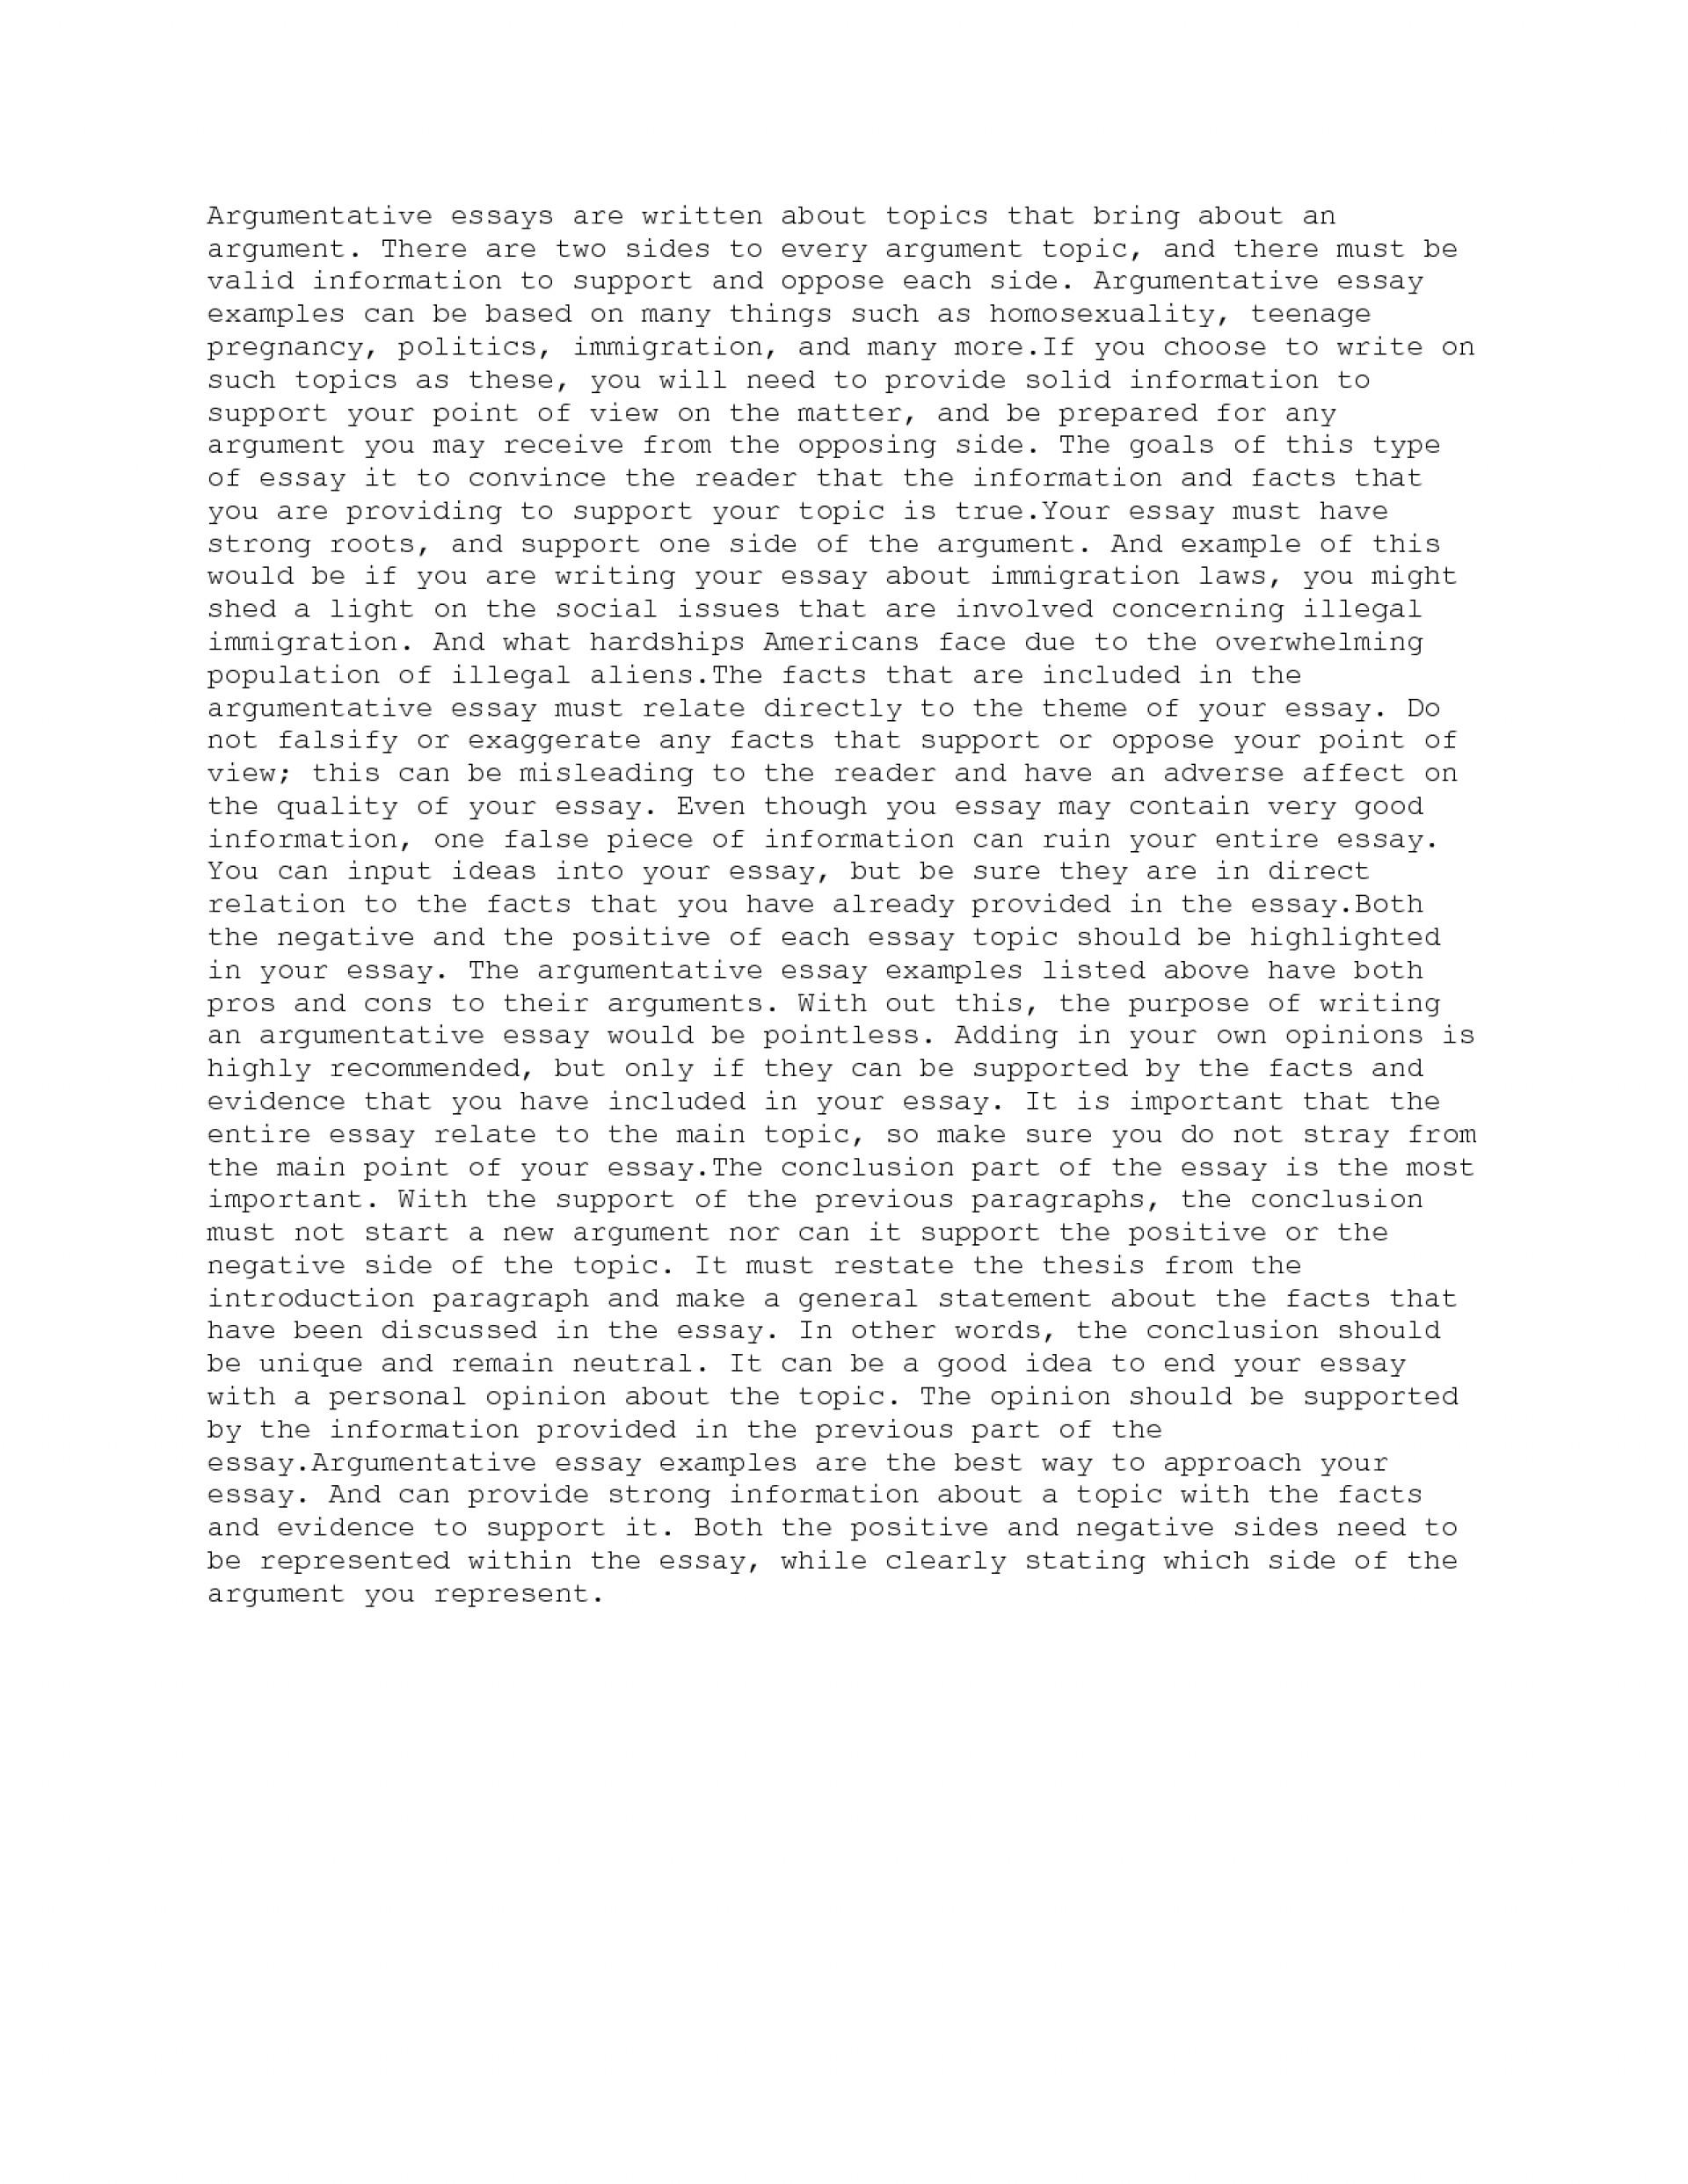 020 Qv3jjq5wkt Best Common App Essays Essay Magnificent 2018 Ivy League New York Times 1920